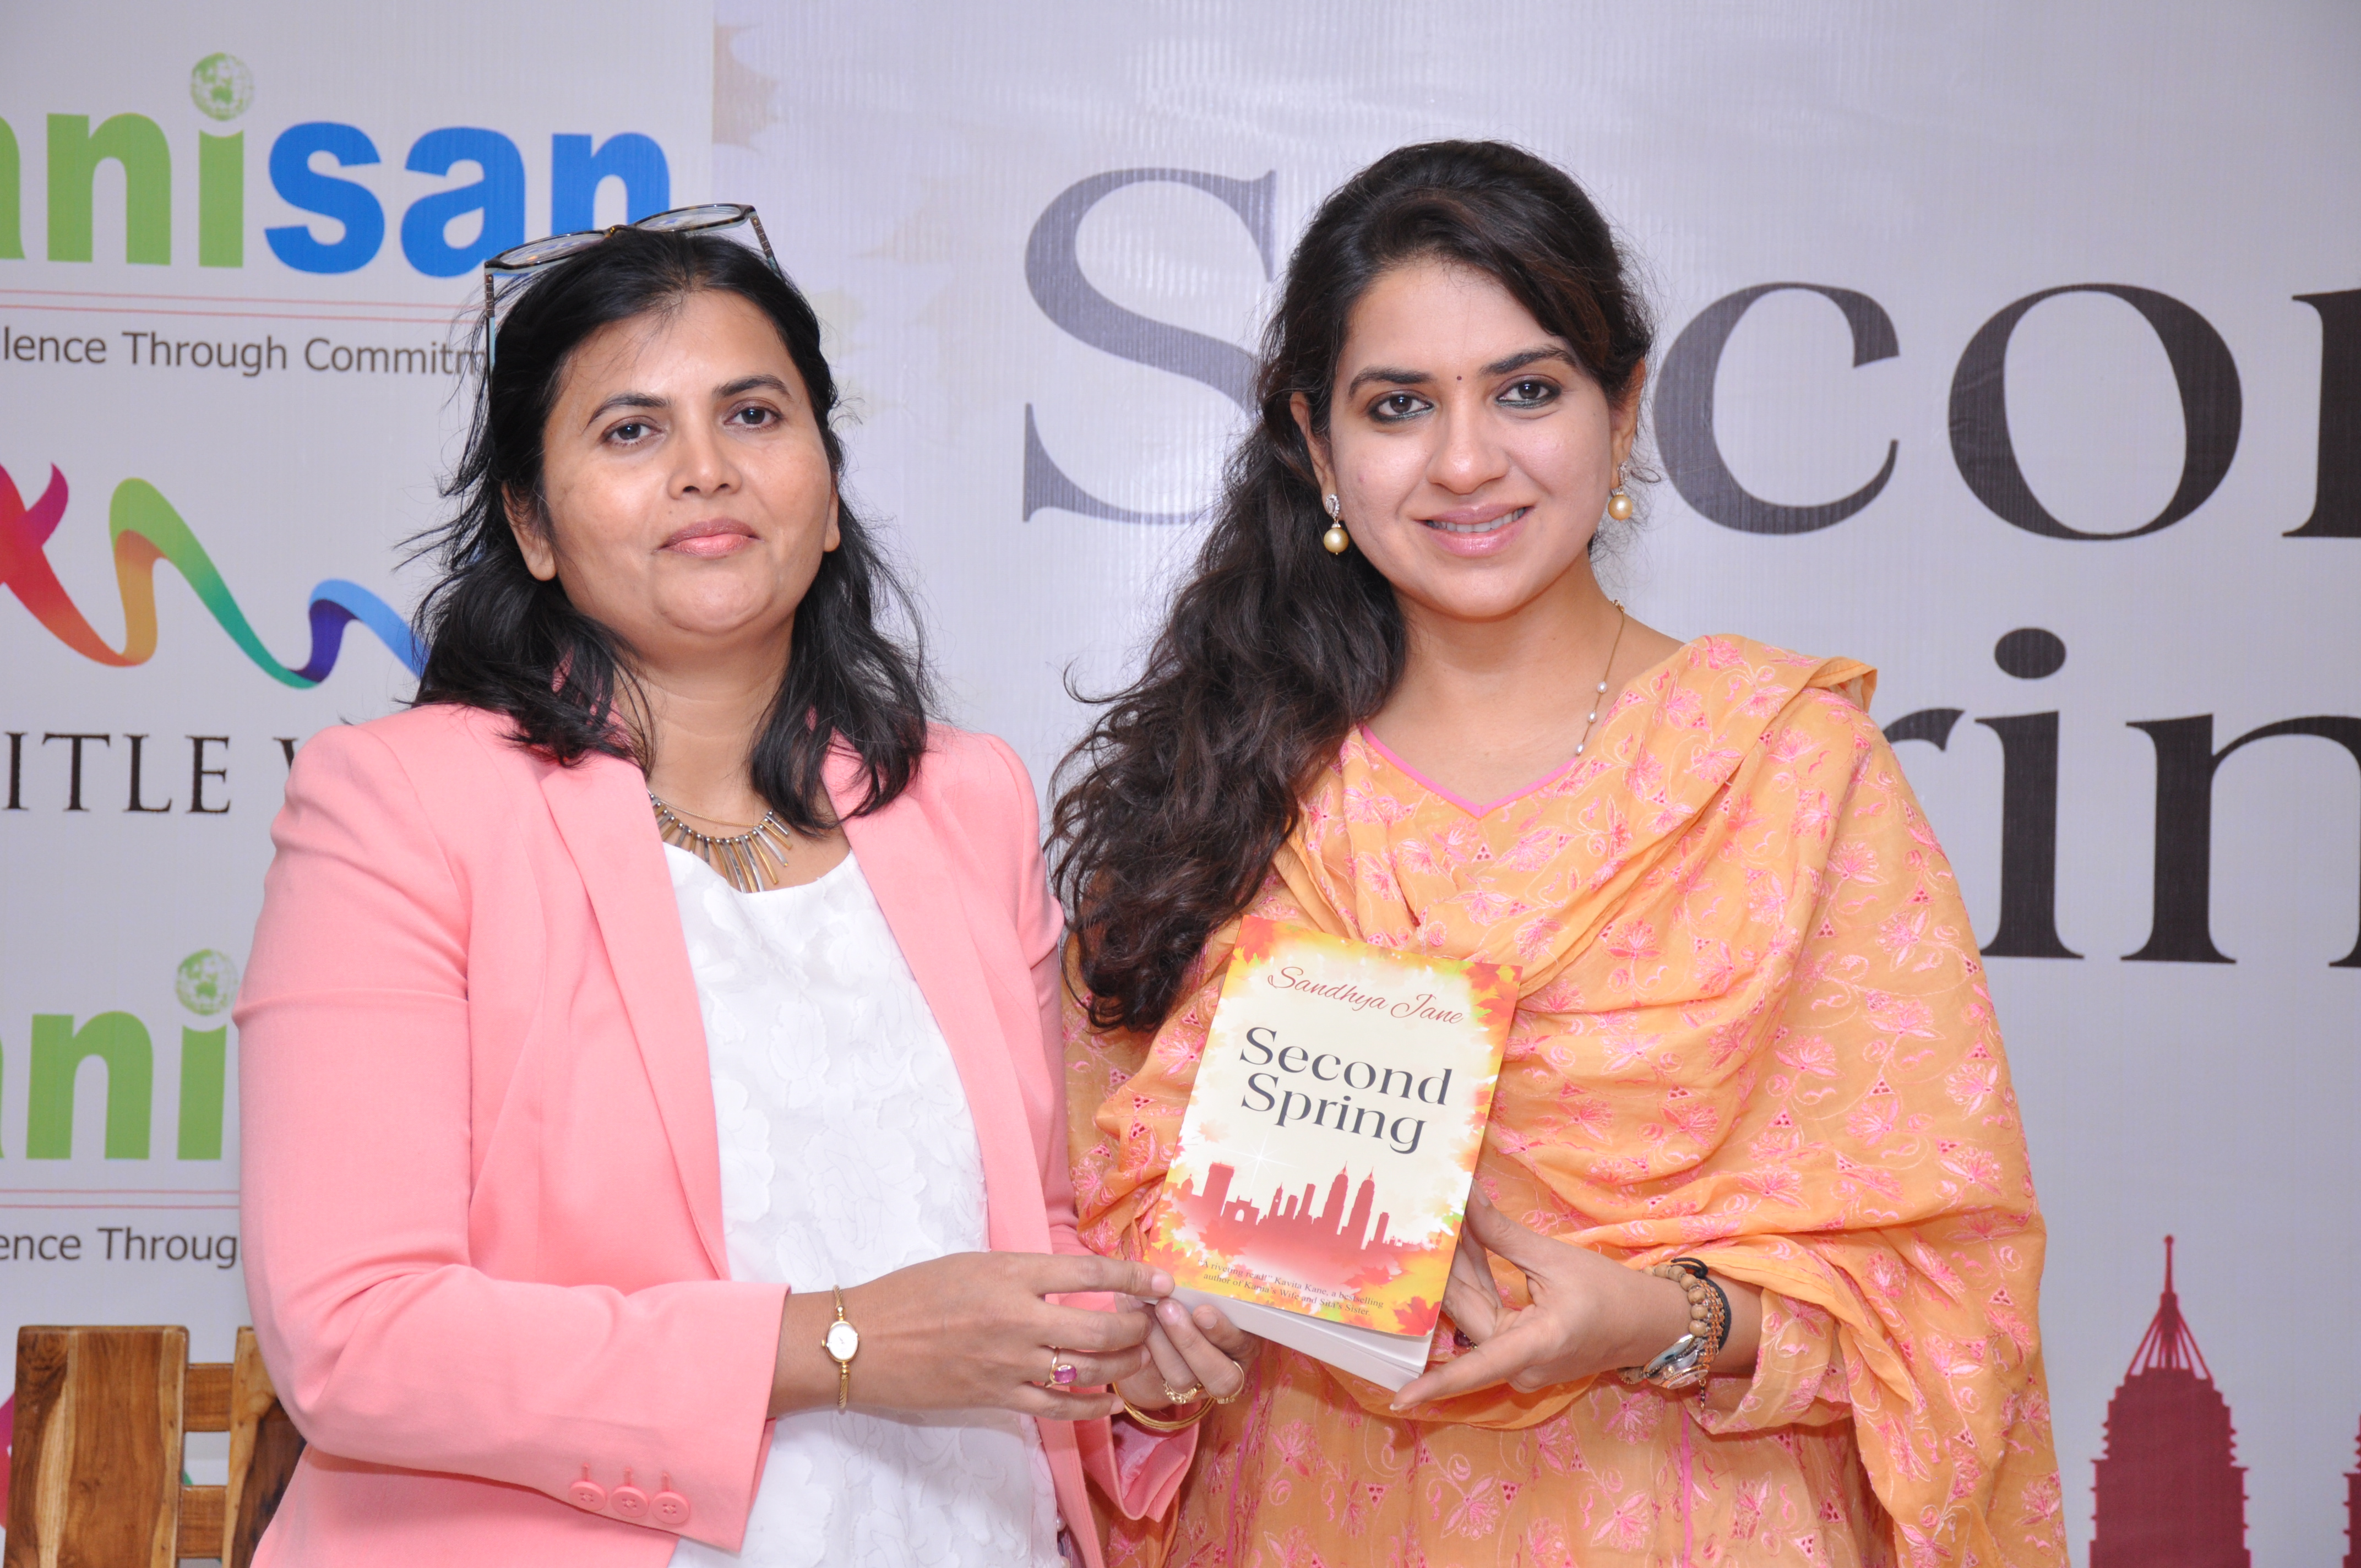 Author Sandhay Jane and Shaina NC